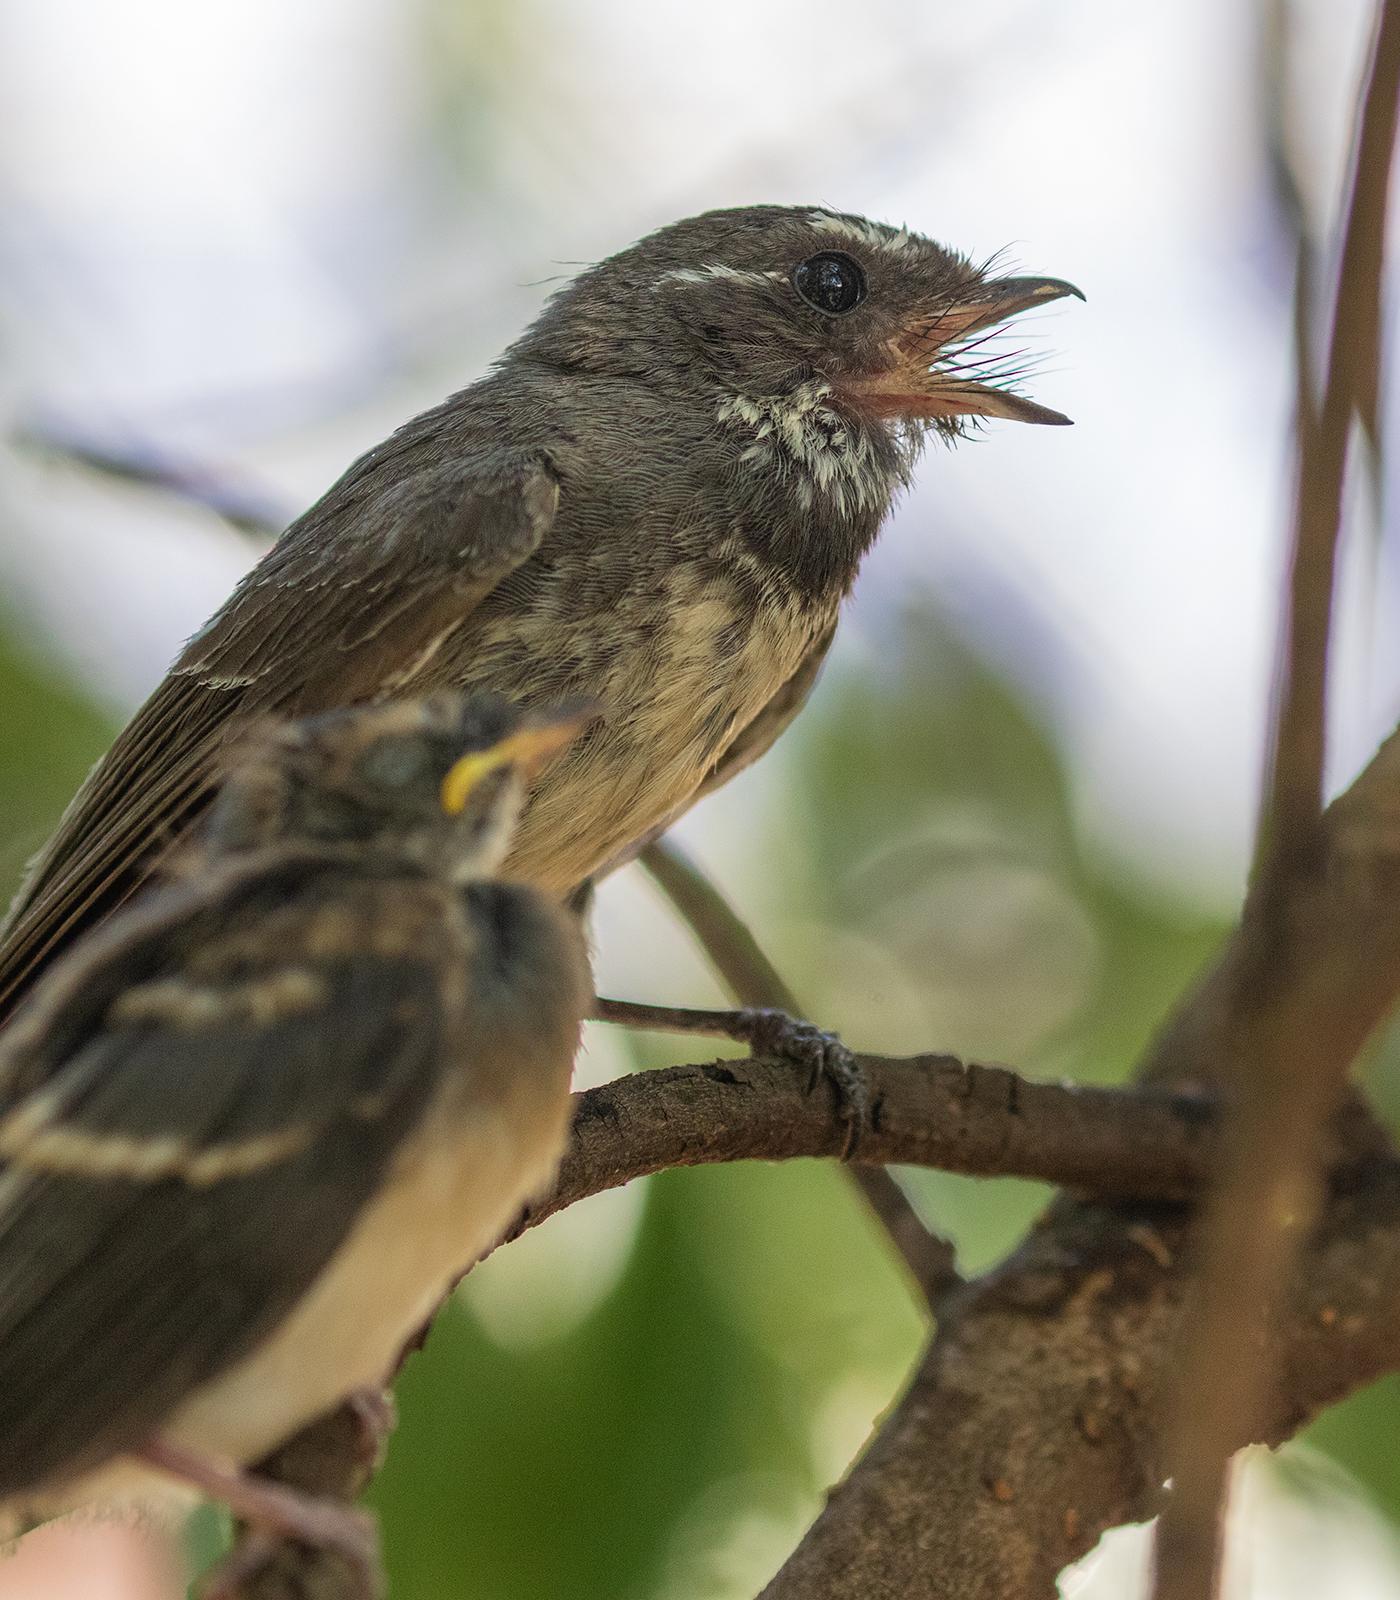 patron saint of birds